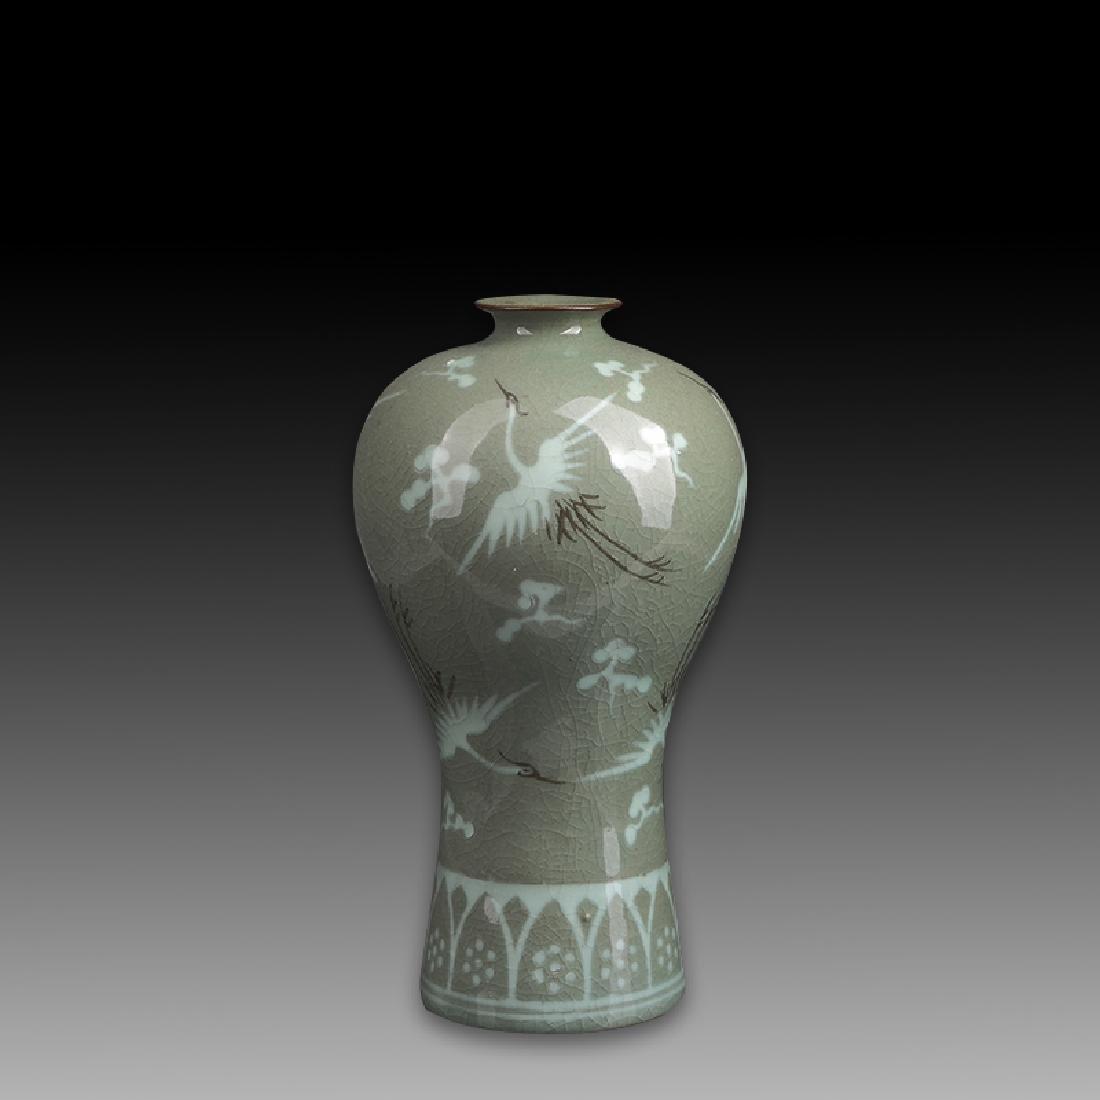 Korean celadon jar decorated with cranes